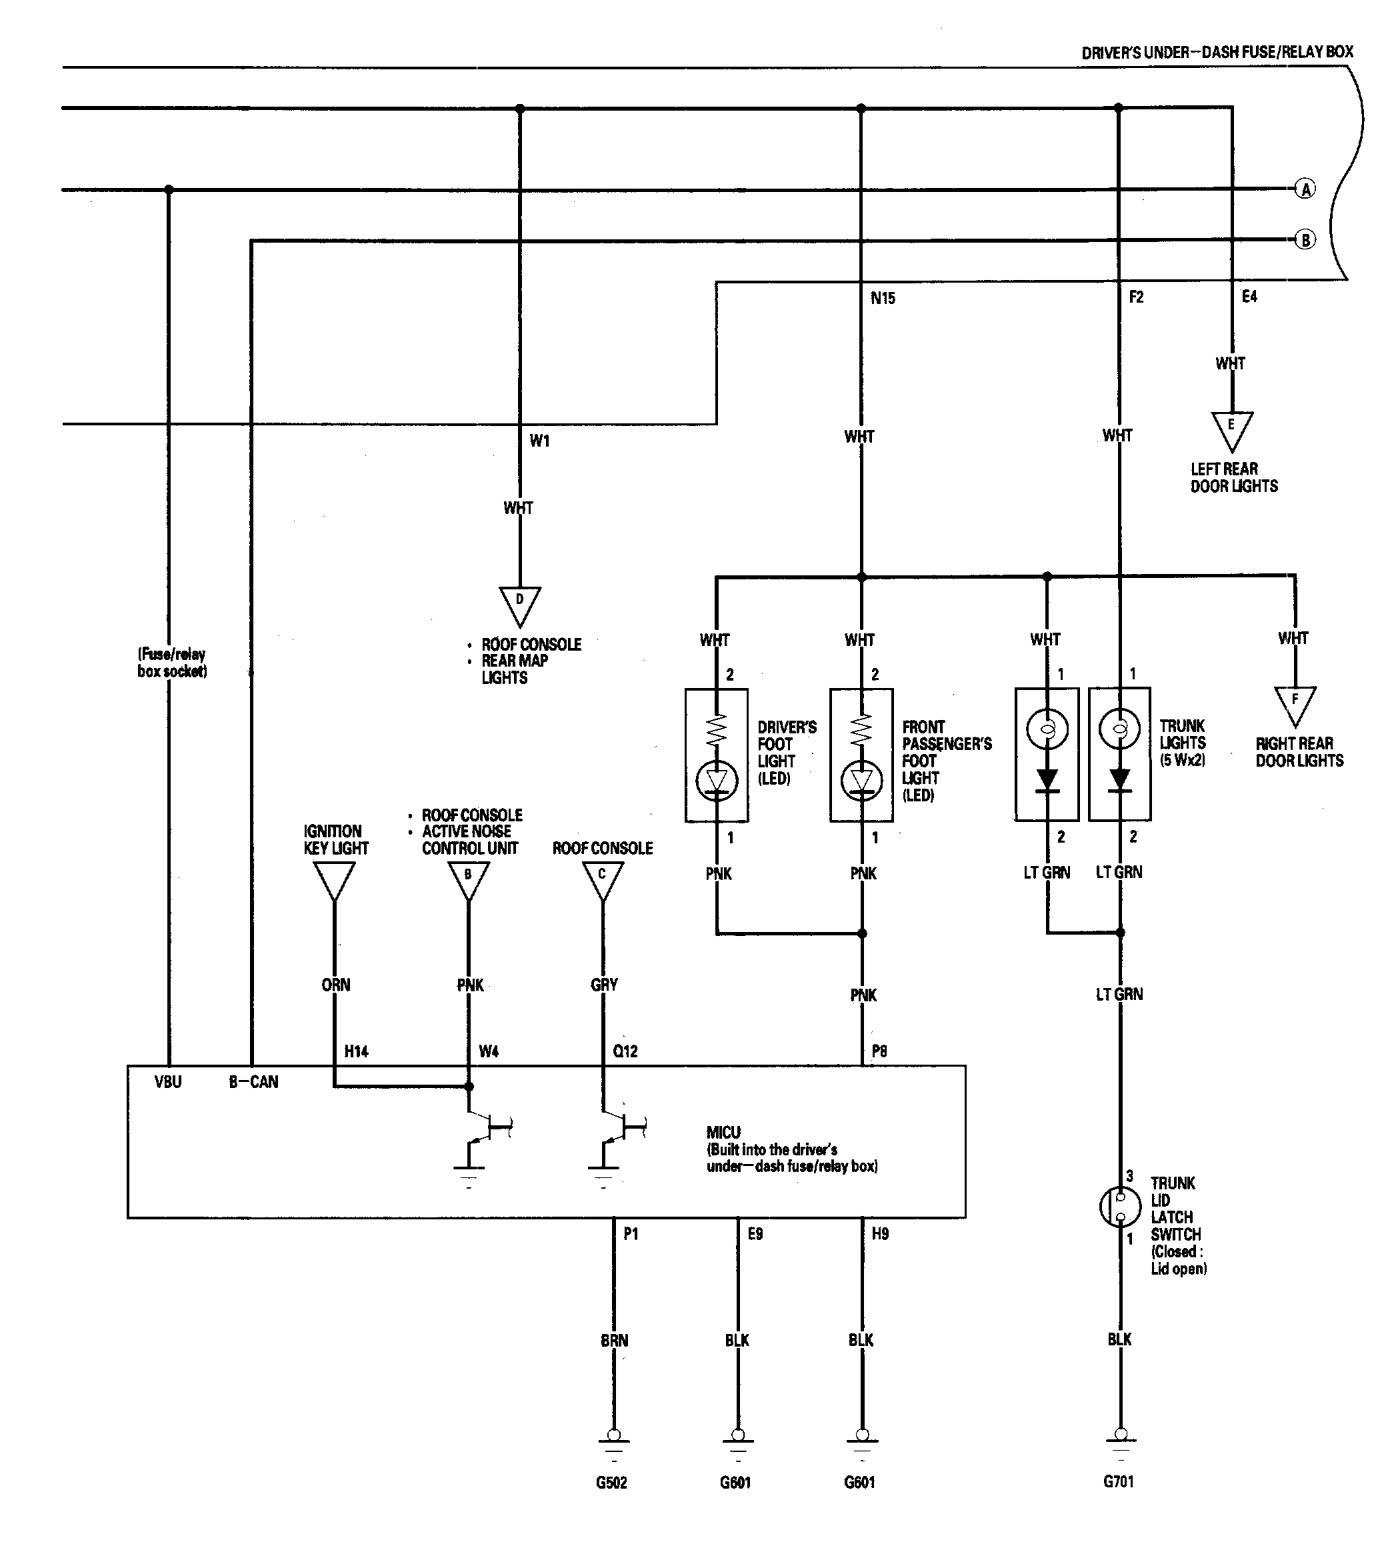 Acura Rl 2005 2006 Wiring Diagrams Interior Lighting Gmc Canyon Fuse Relay Box Diagram Part 2